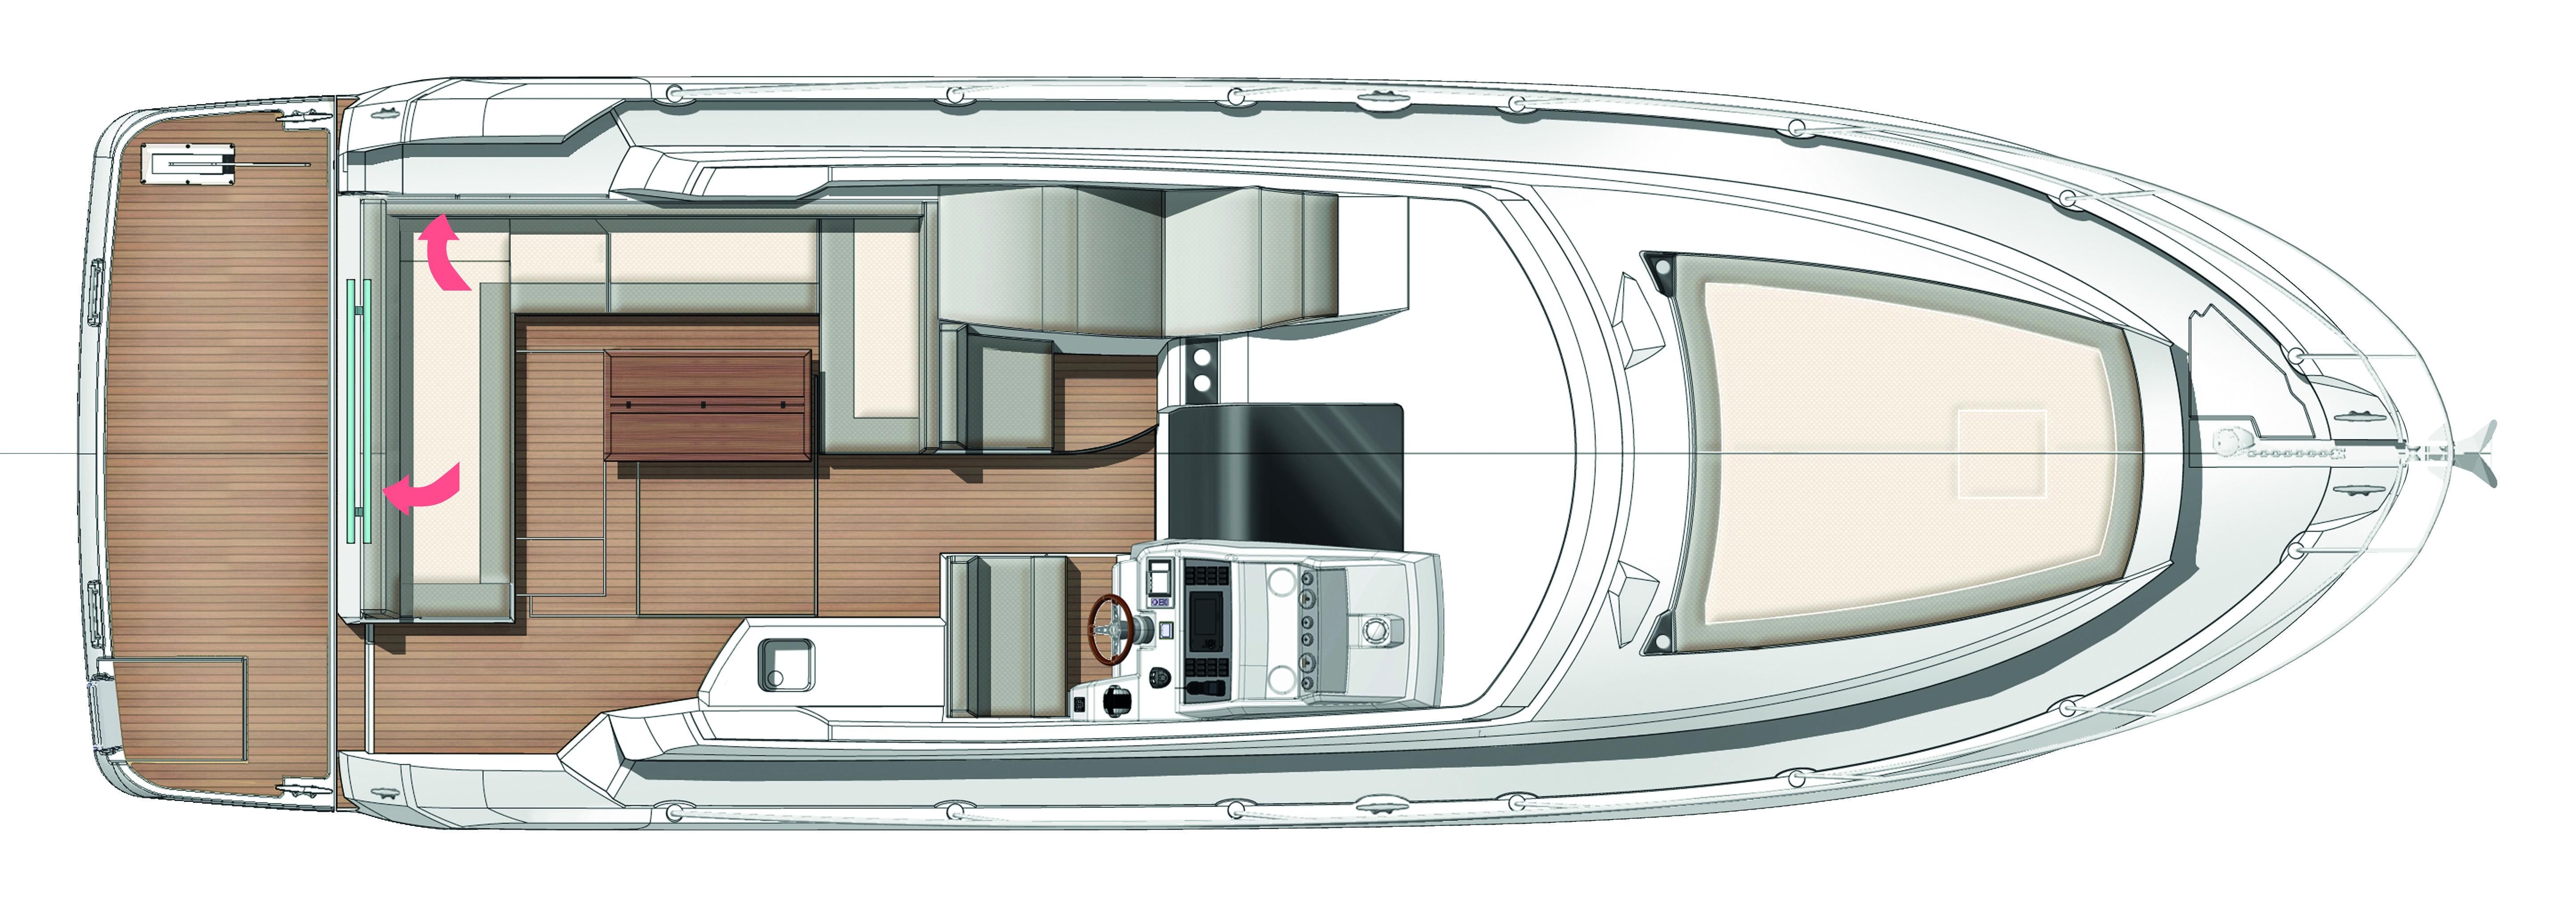 LD36-Pont-EU-Cockpit-Lounge-